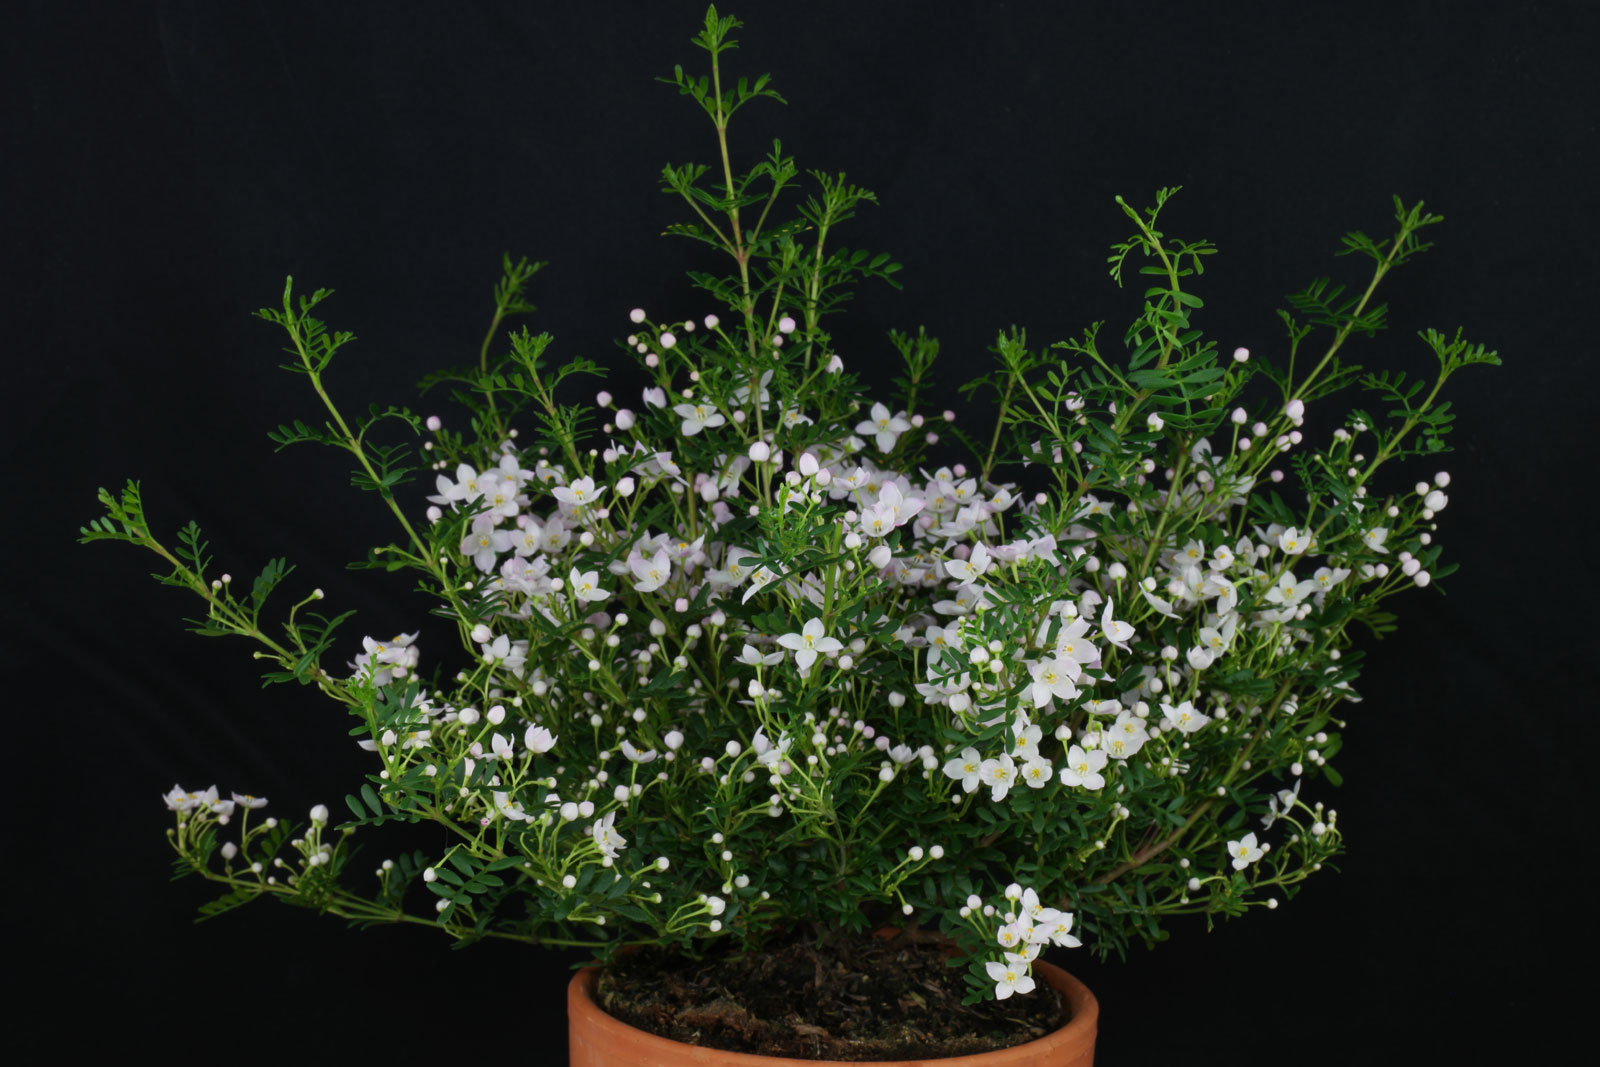 Boronia anemonifolia